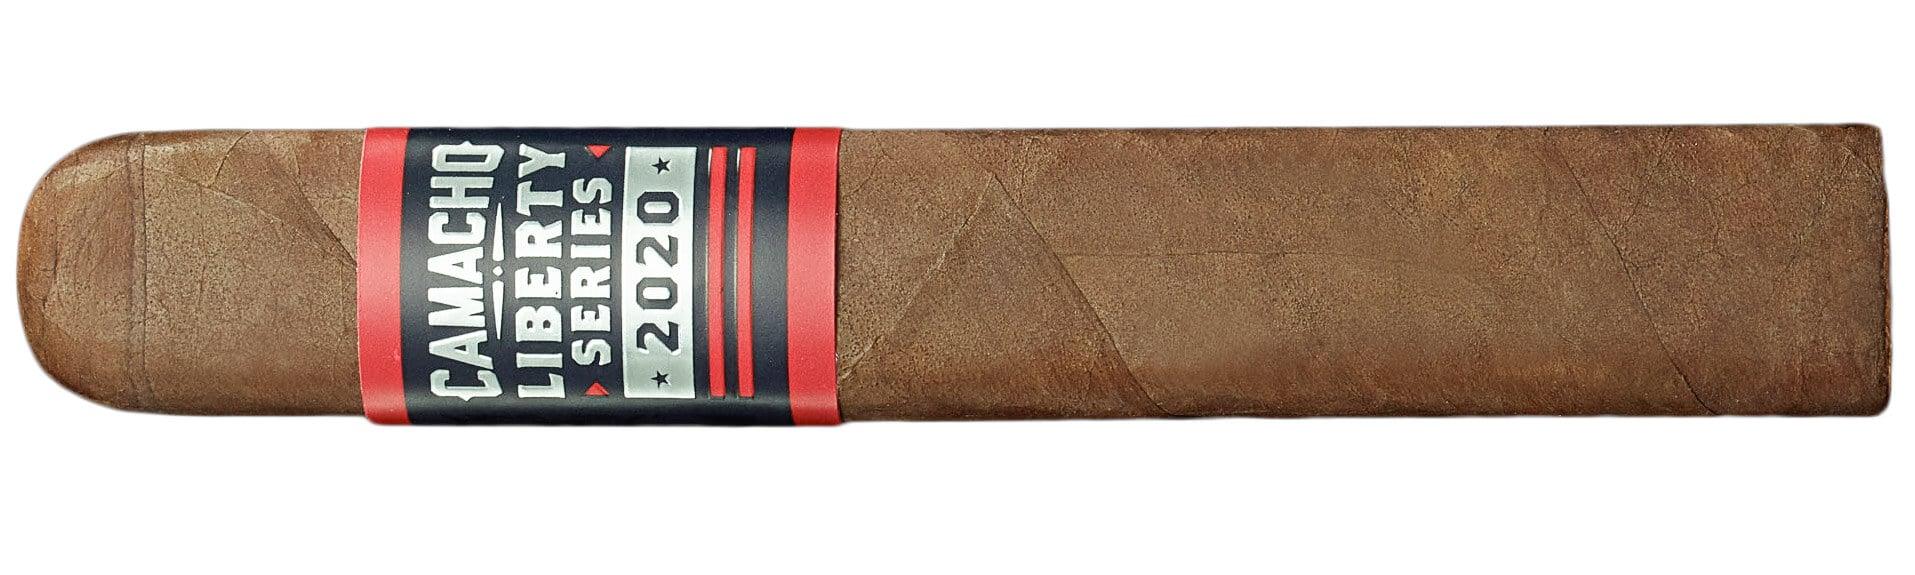 Blind Cigar Review: Camacho | Liberty 2020